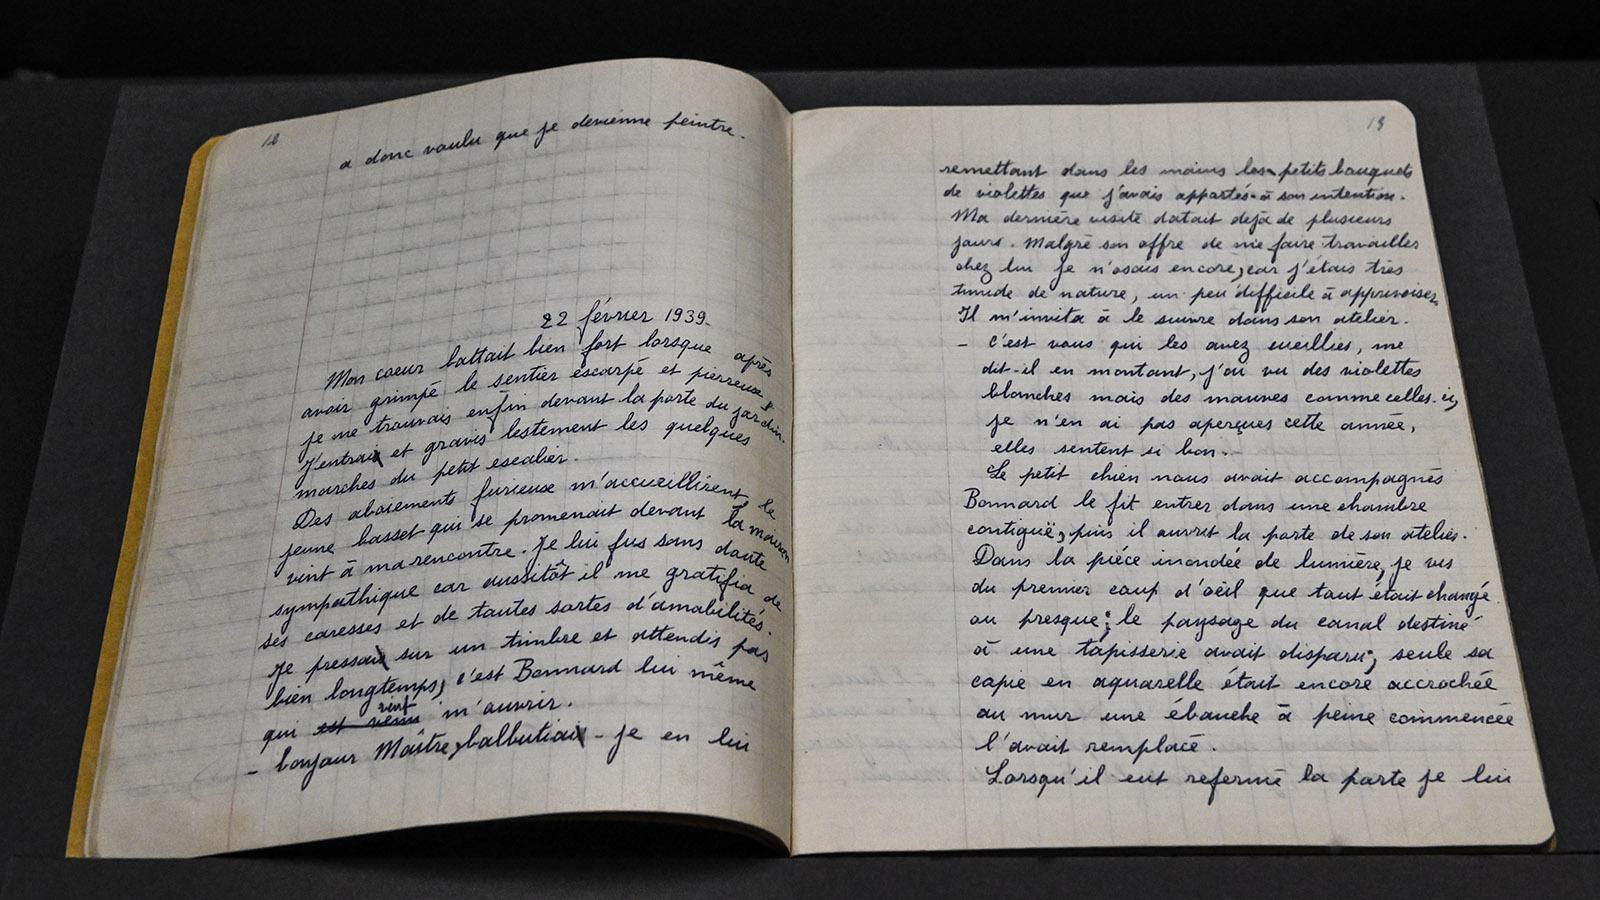 Musée Bonnard: Pierre Bonnard führte Tagebuch. Foto: Hilke Maunder